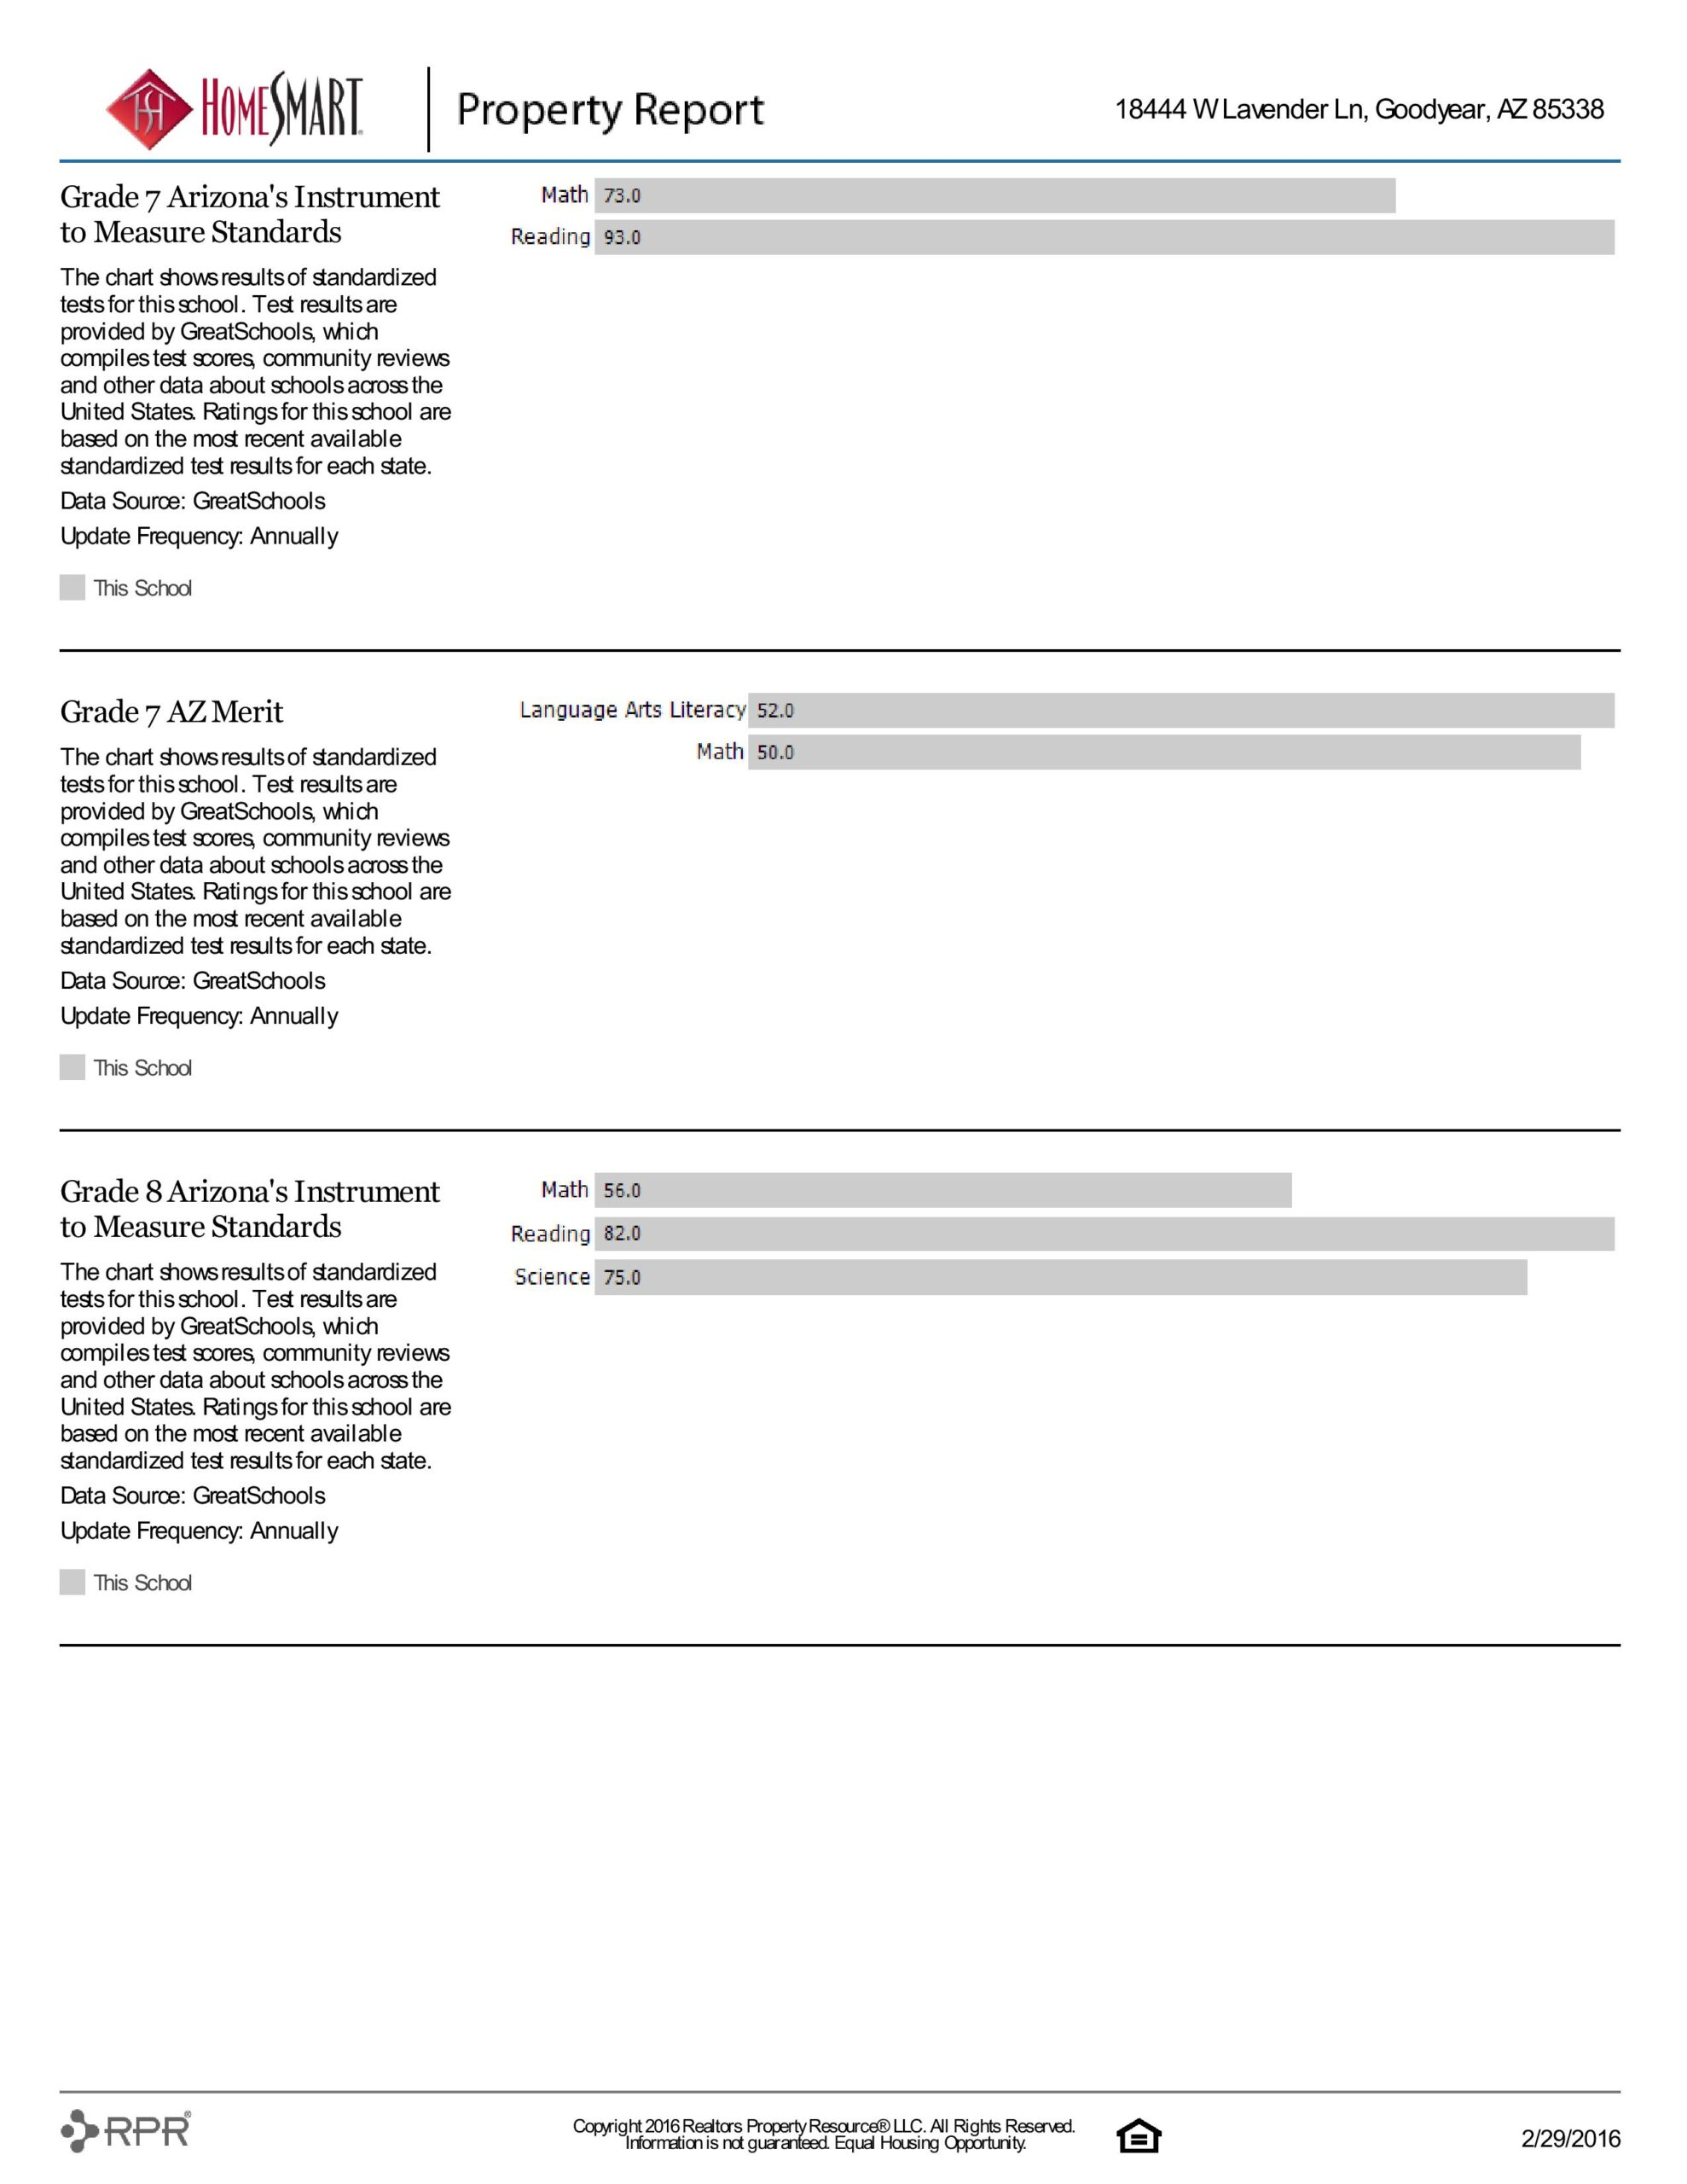 18444 W LAVENDER LN PROPERTY REPORT-page-033